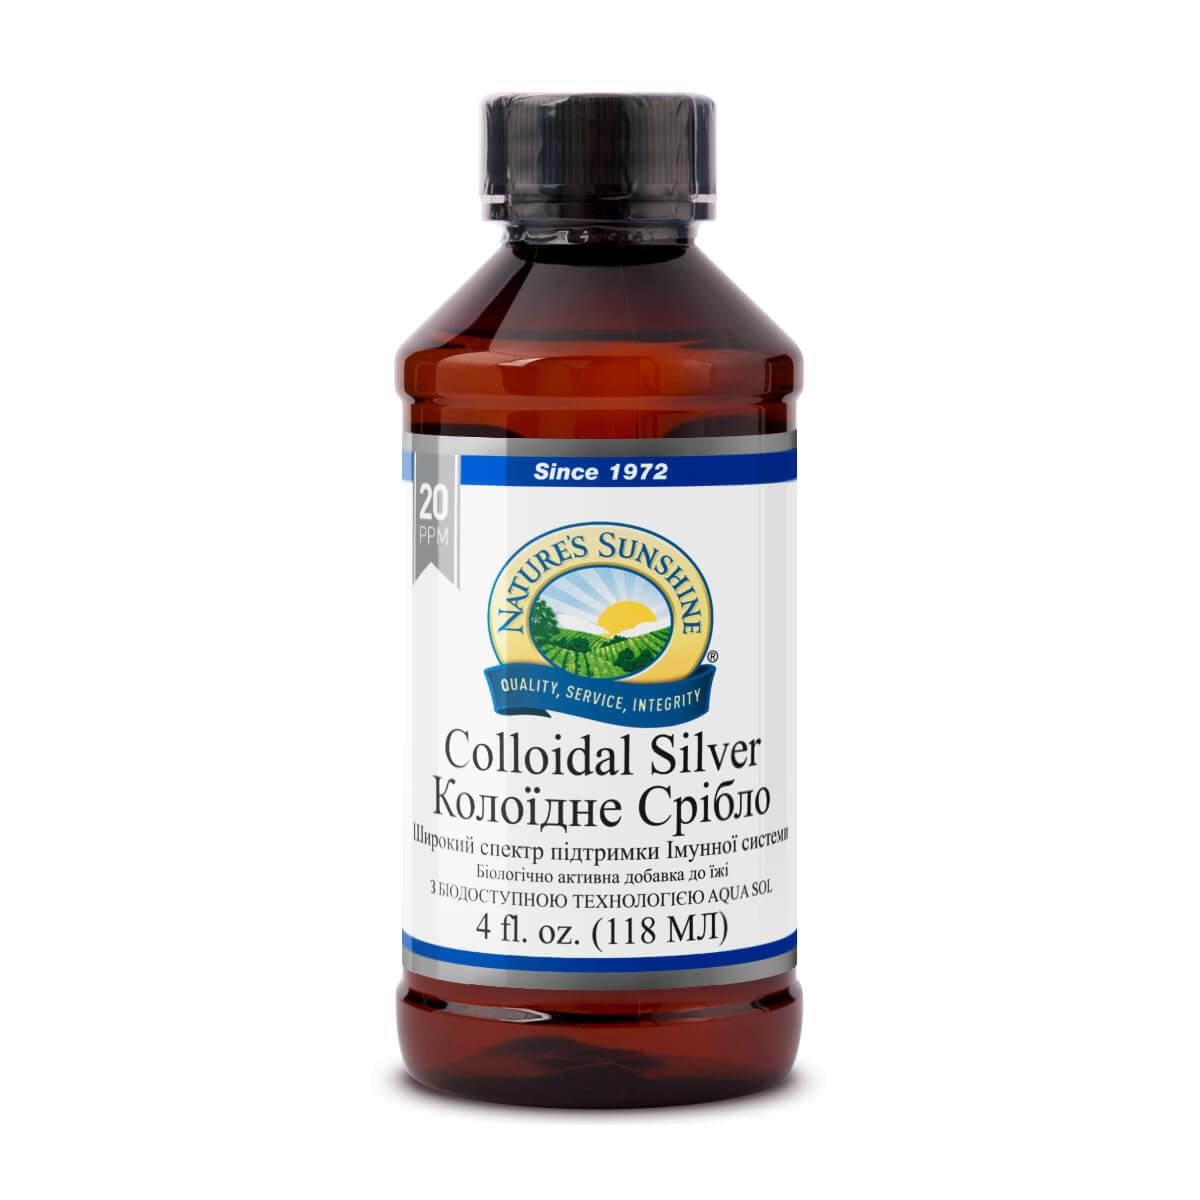 Коллоидное Серебро Форте  БАД nsp натуральный антибиотик, не разрушающий флору при гайморите, гриппе